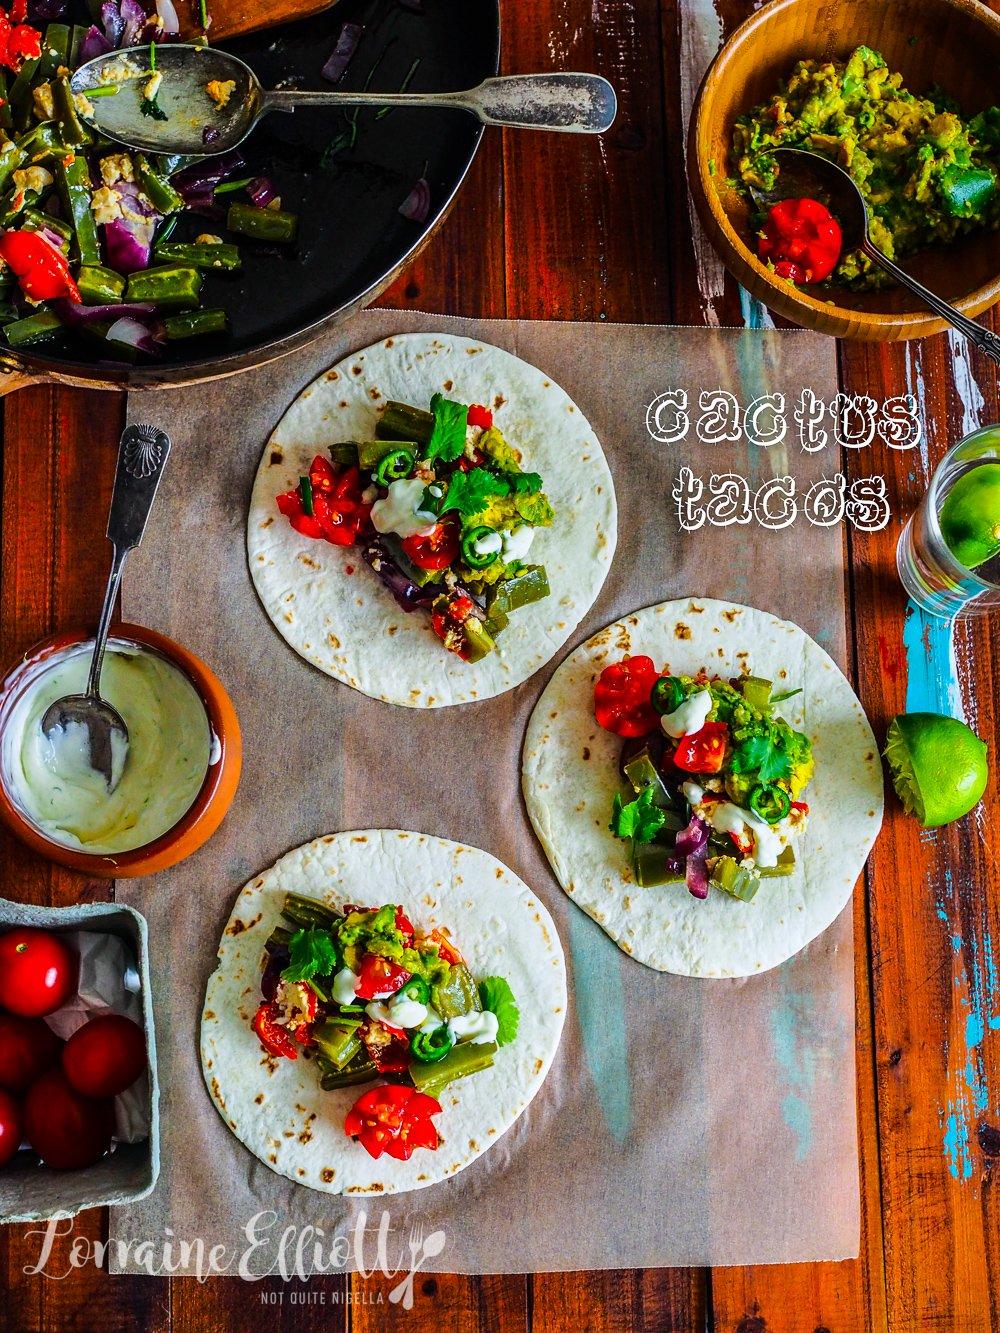 A Thorny Ingredient: Cactus or Nopales Tacos